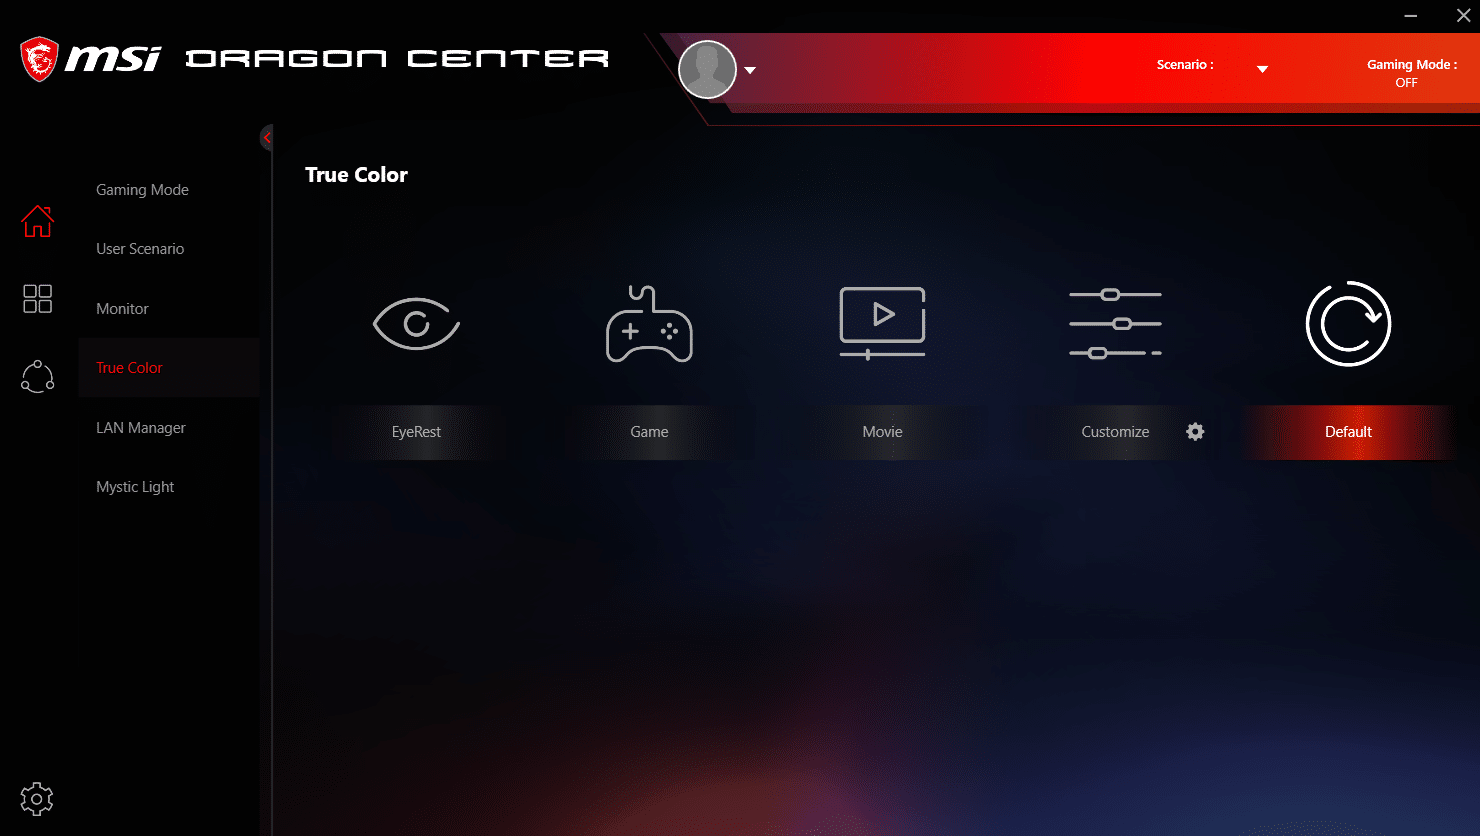 MSI Dragon Center profil d'écran